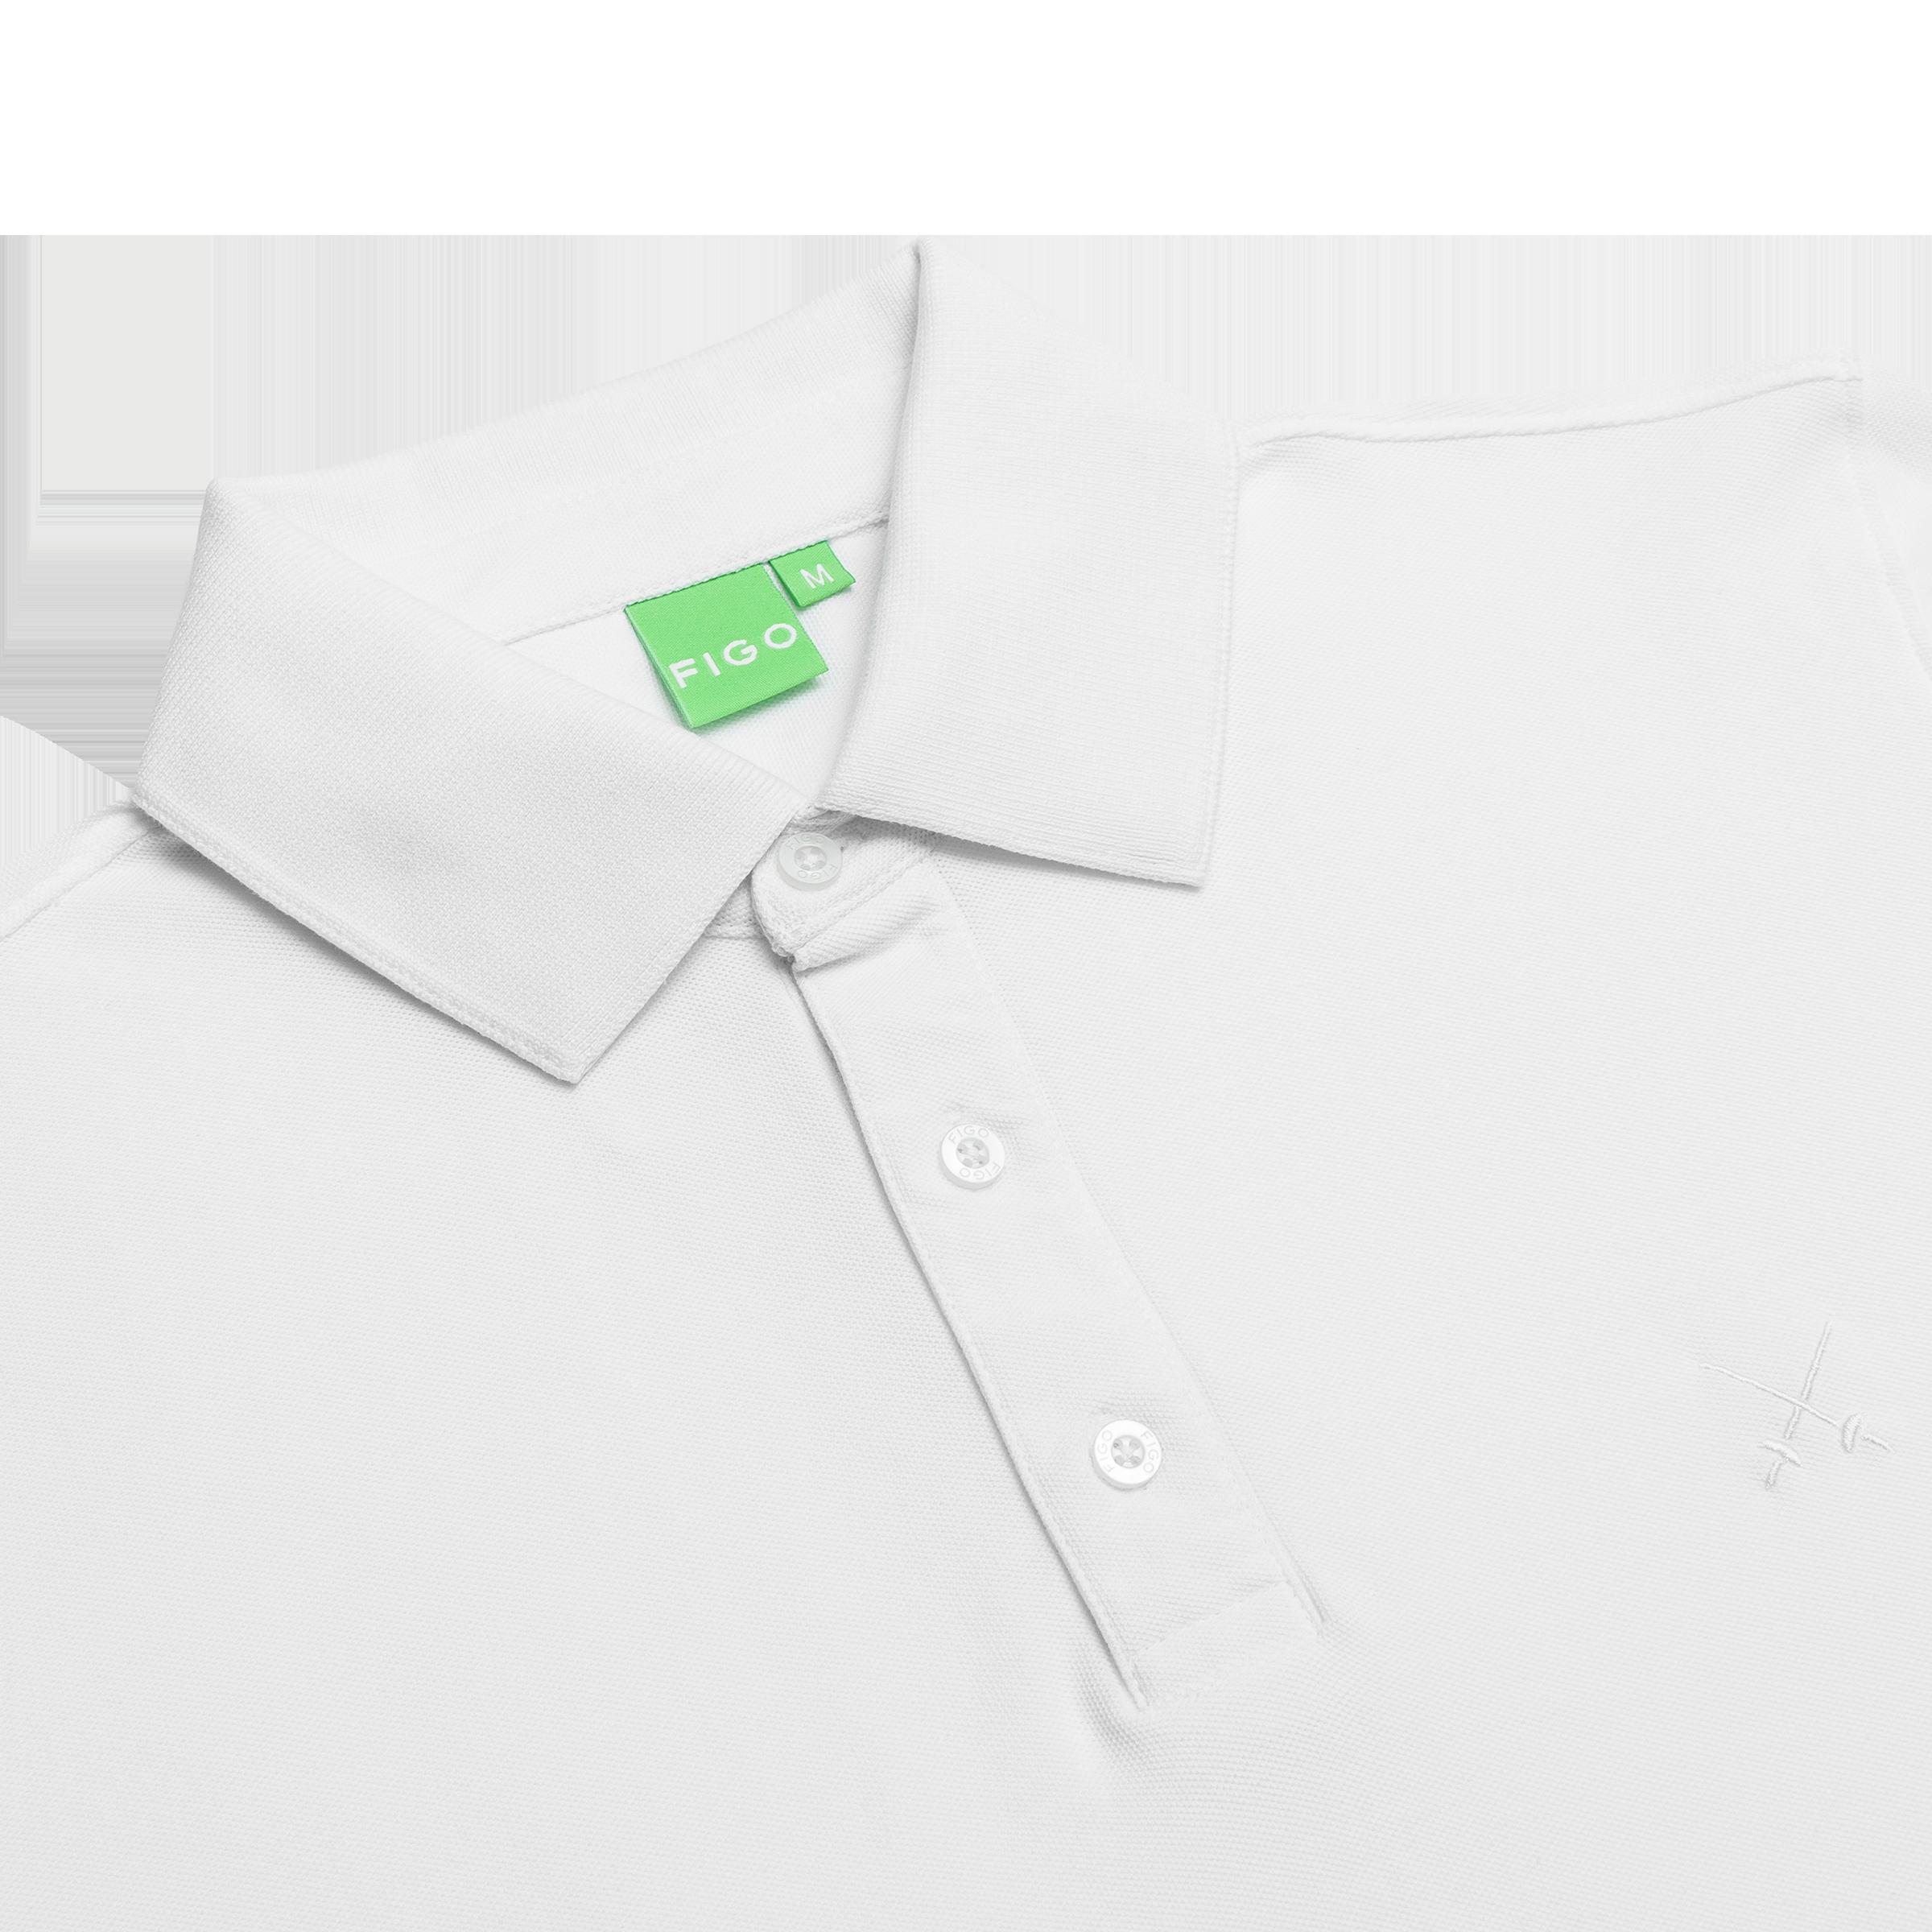 white shirt product photo